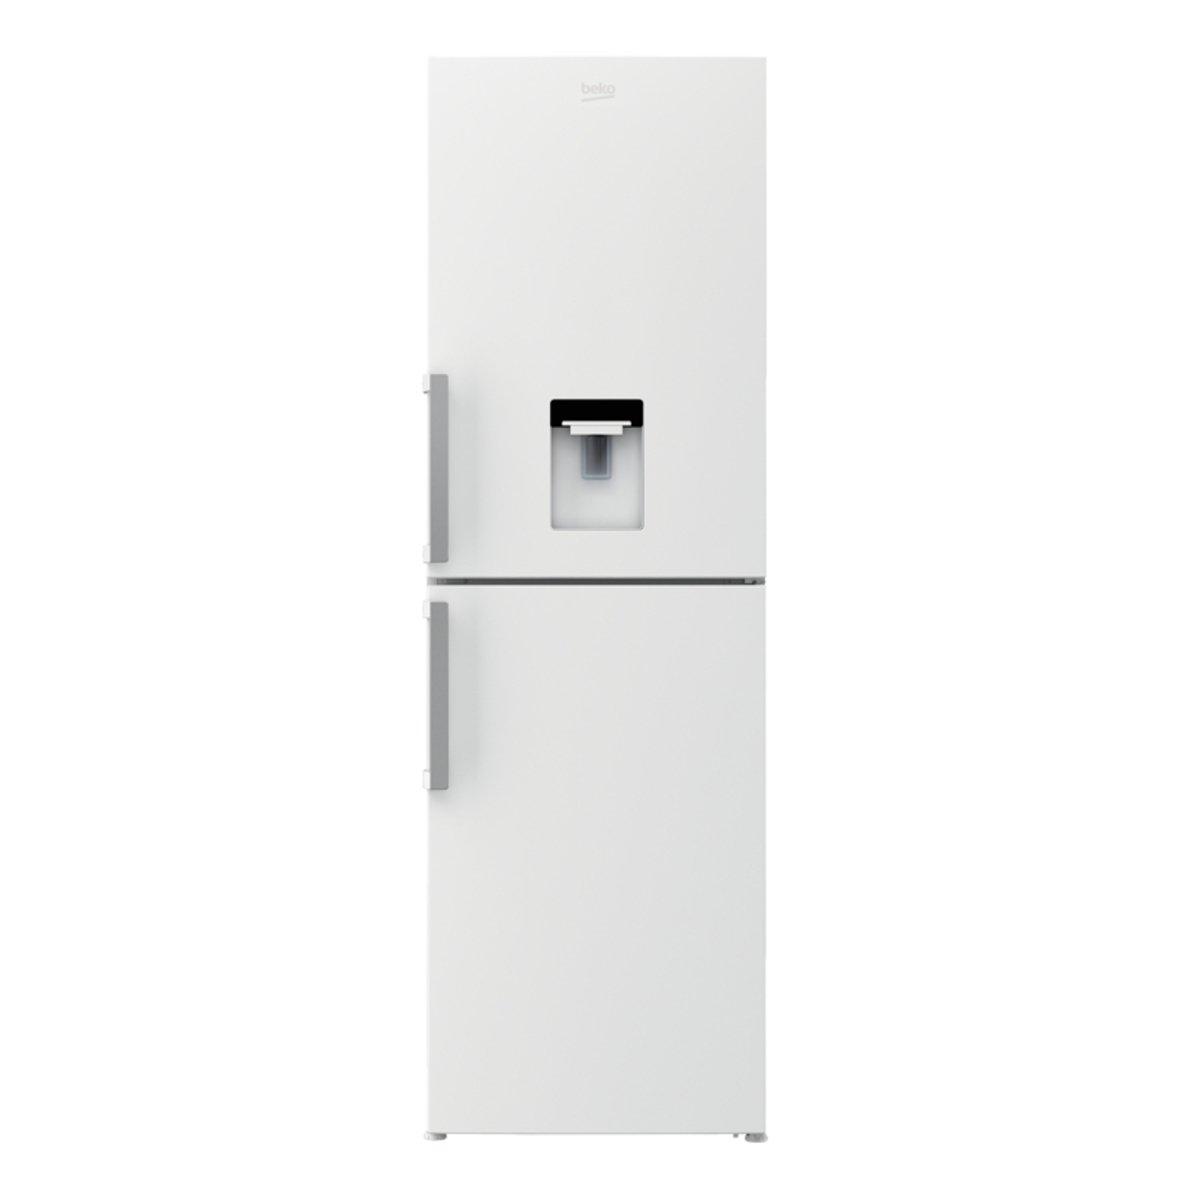 Beko CFP1691DW Freestanding Frost Free A 201L Fridge 156L Freezer in White